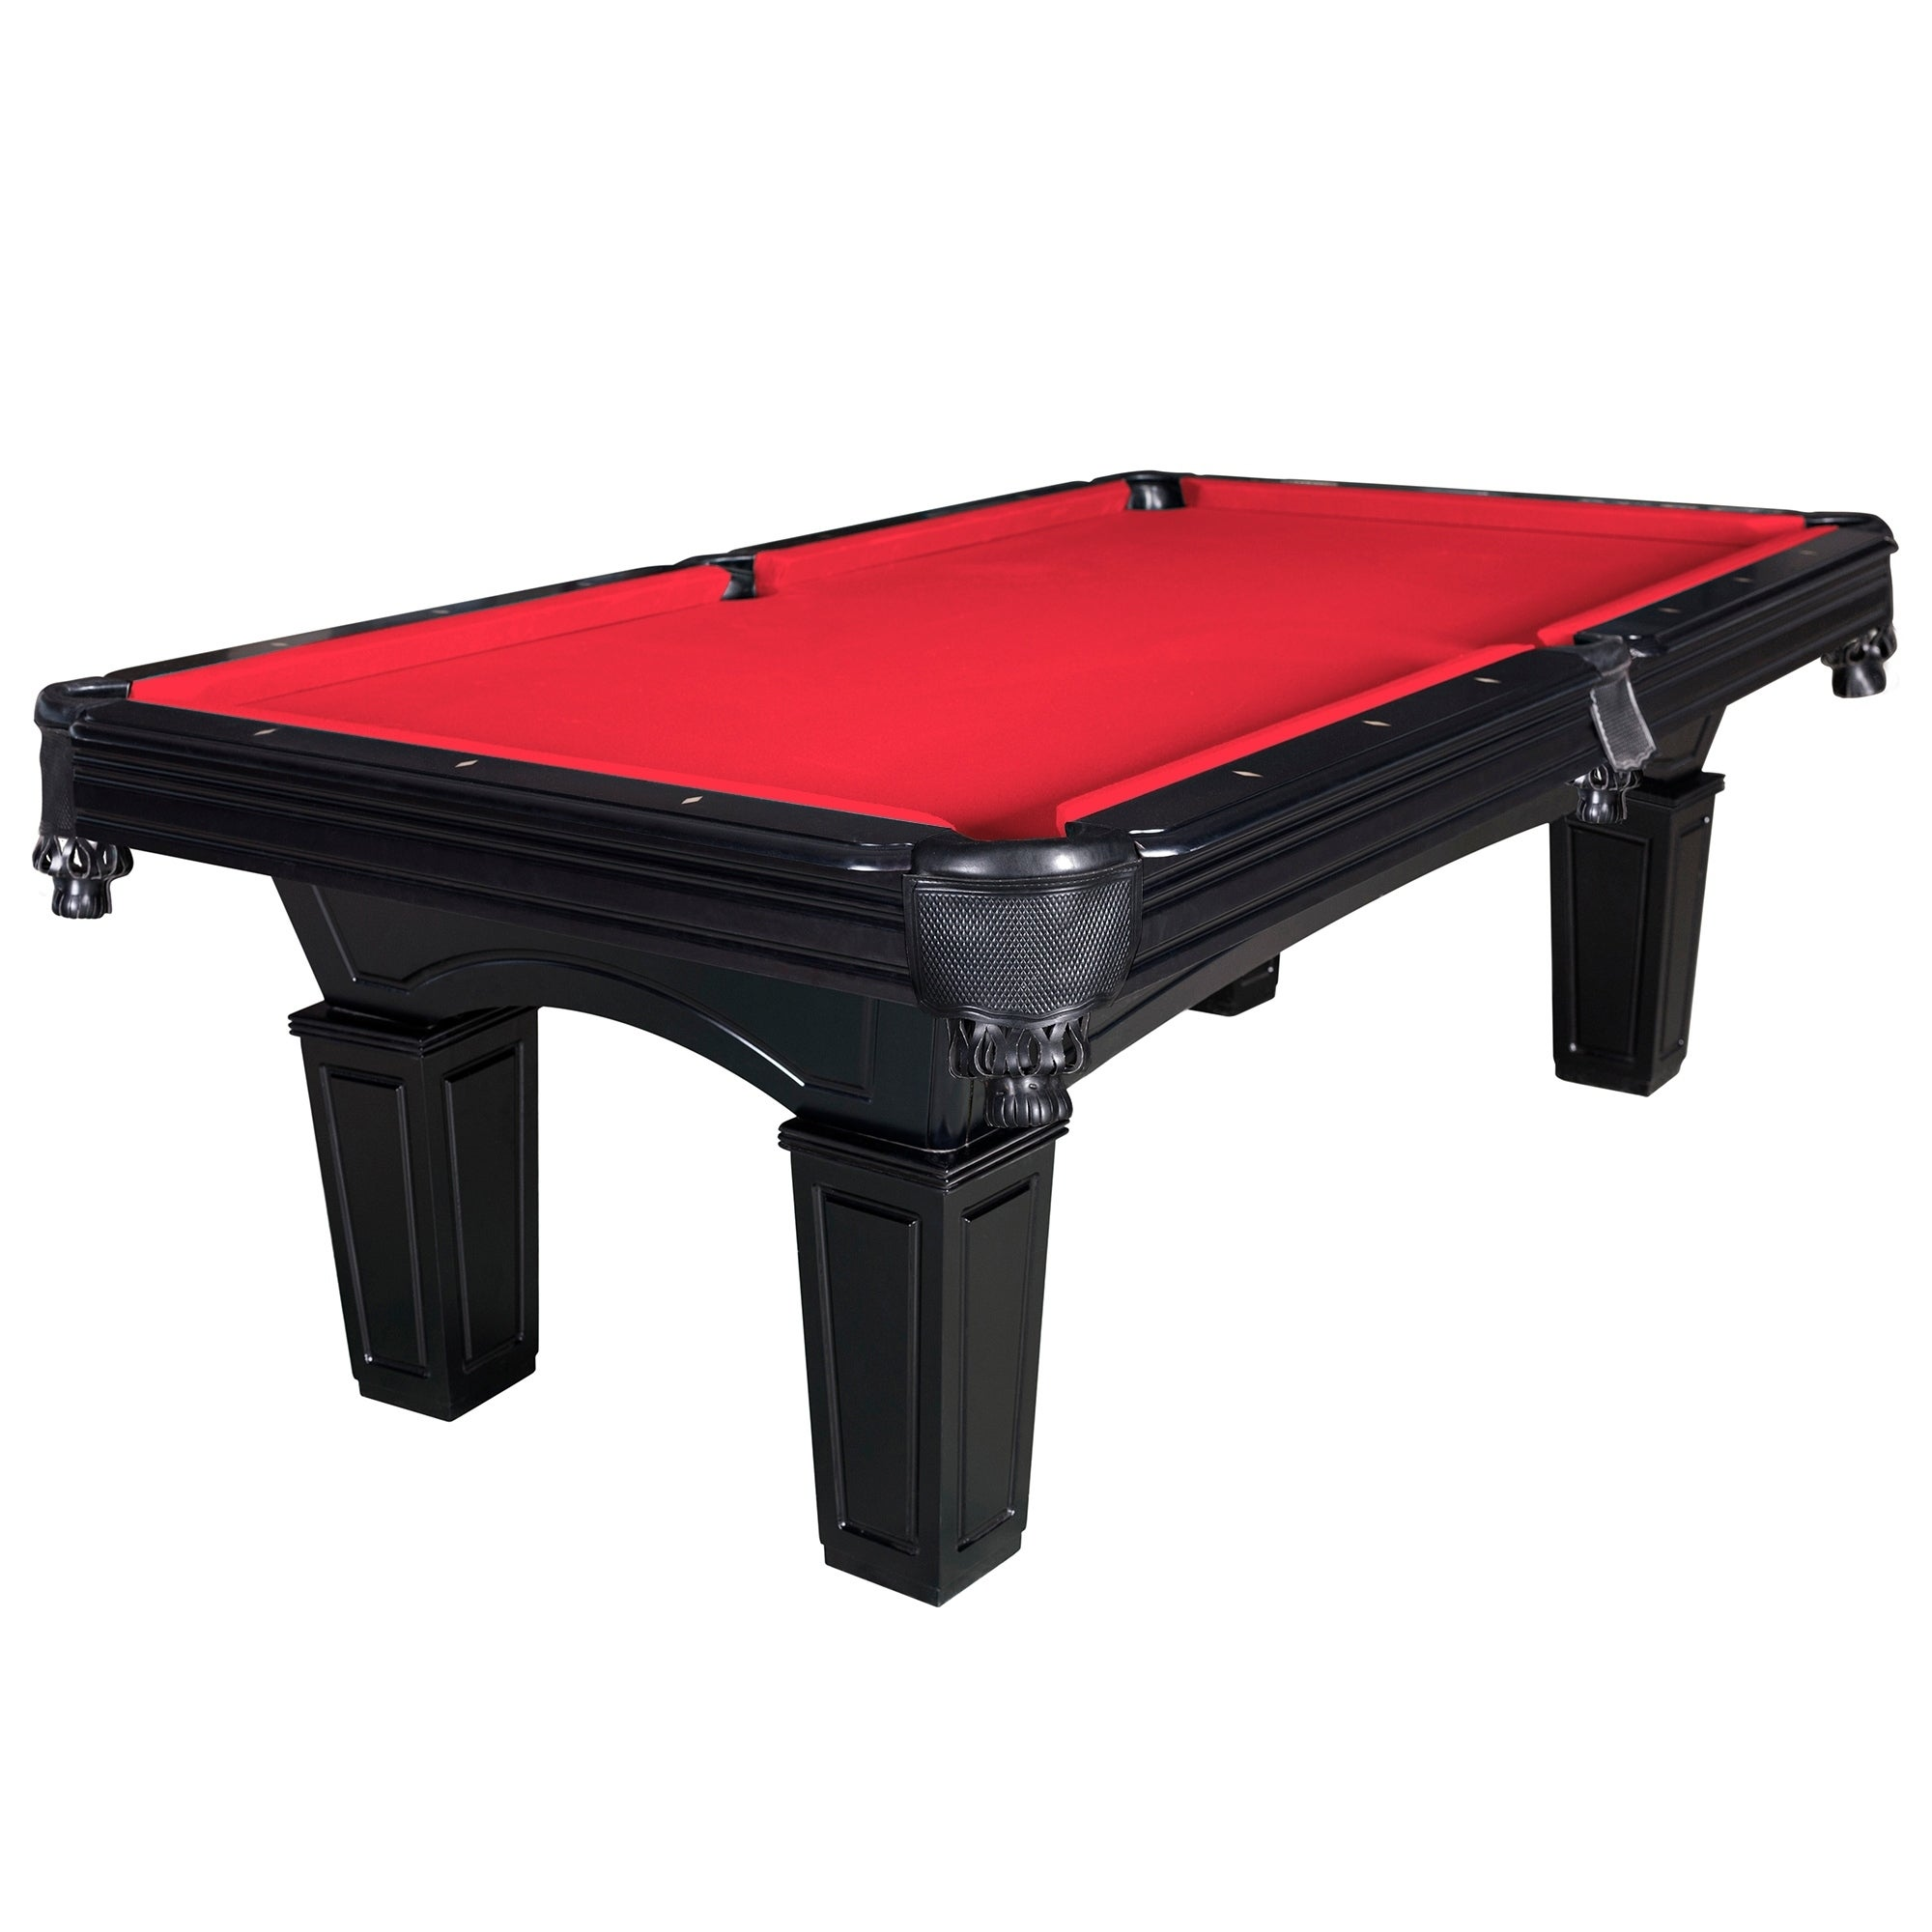 Bon Shop Cobra 8 Ft Slate Billiard Pool Table W/ Red Felt   Free Shipping Today    Overstock.com   17910795